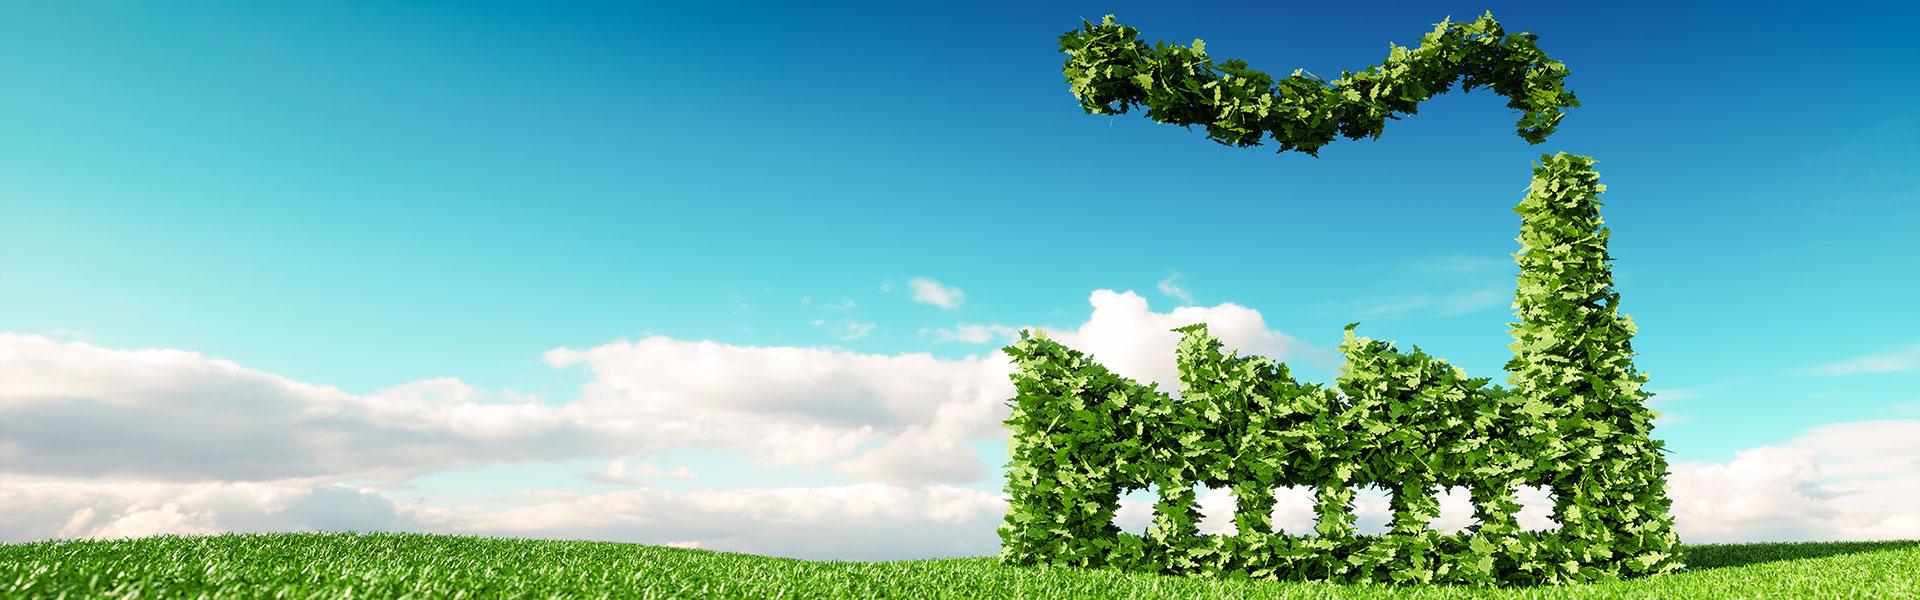 banner-environmental-policy-449-5deb5de9c90edb7ea576a590d84226b6.jpg